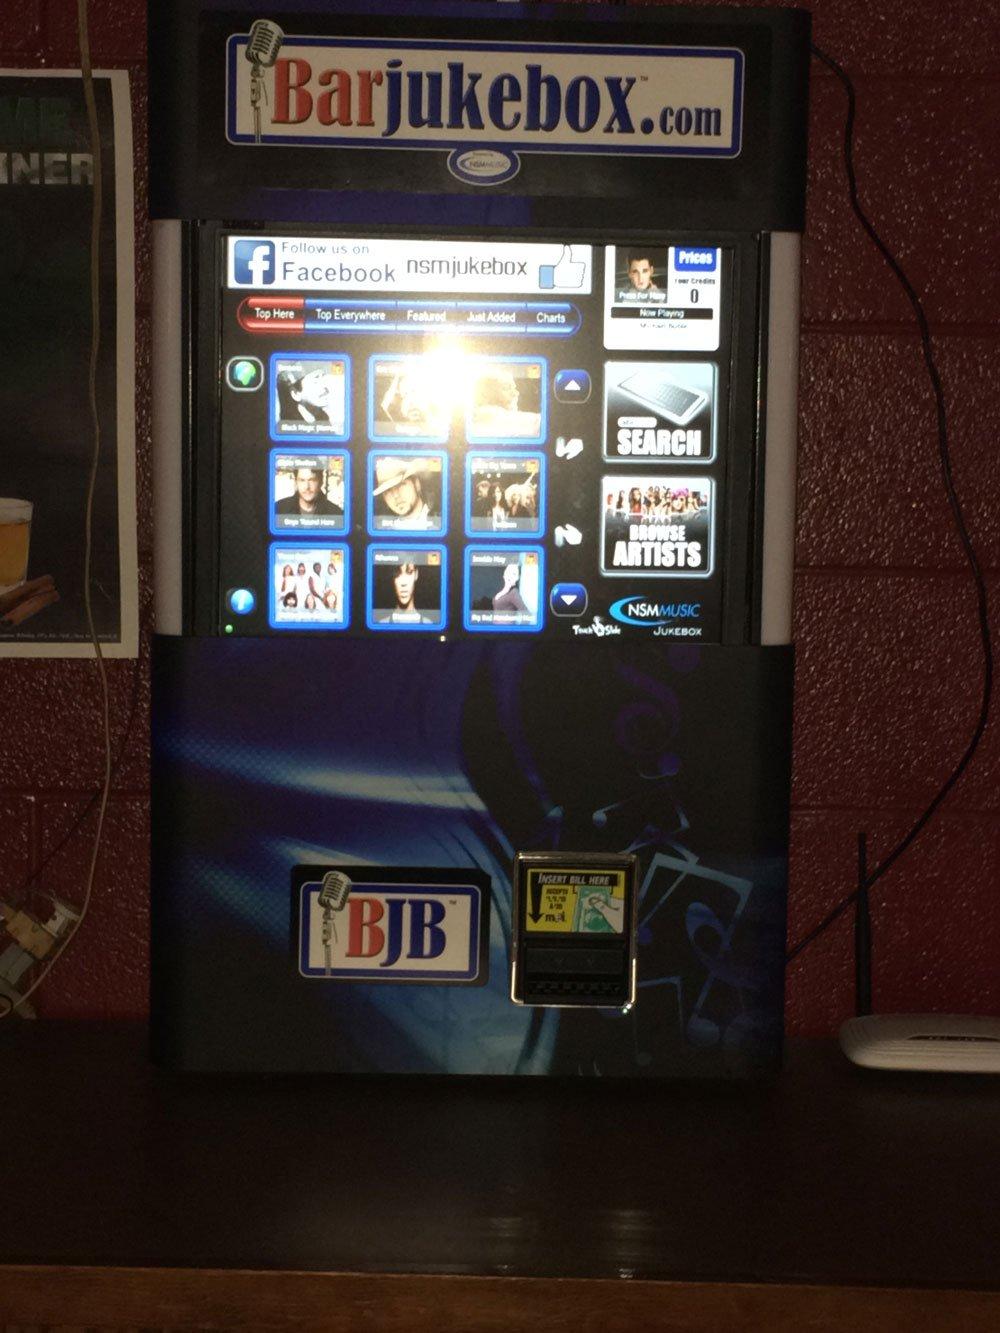 Bar jukebox